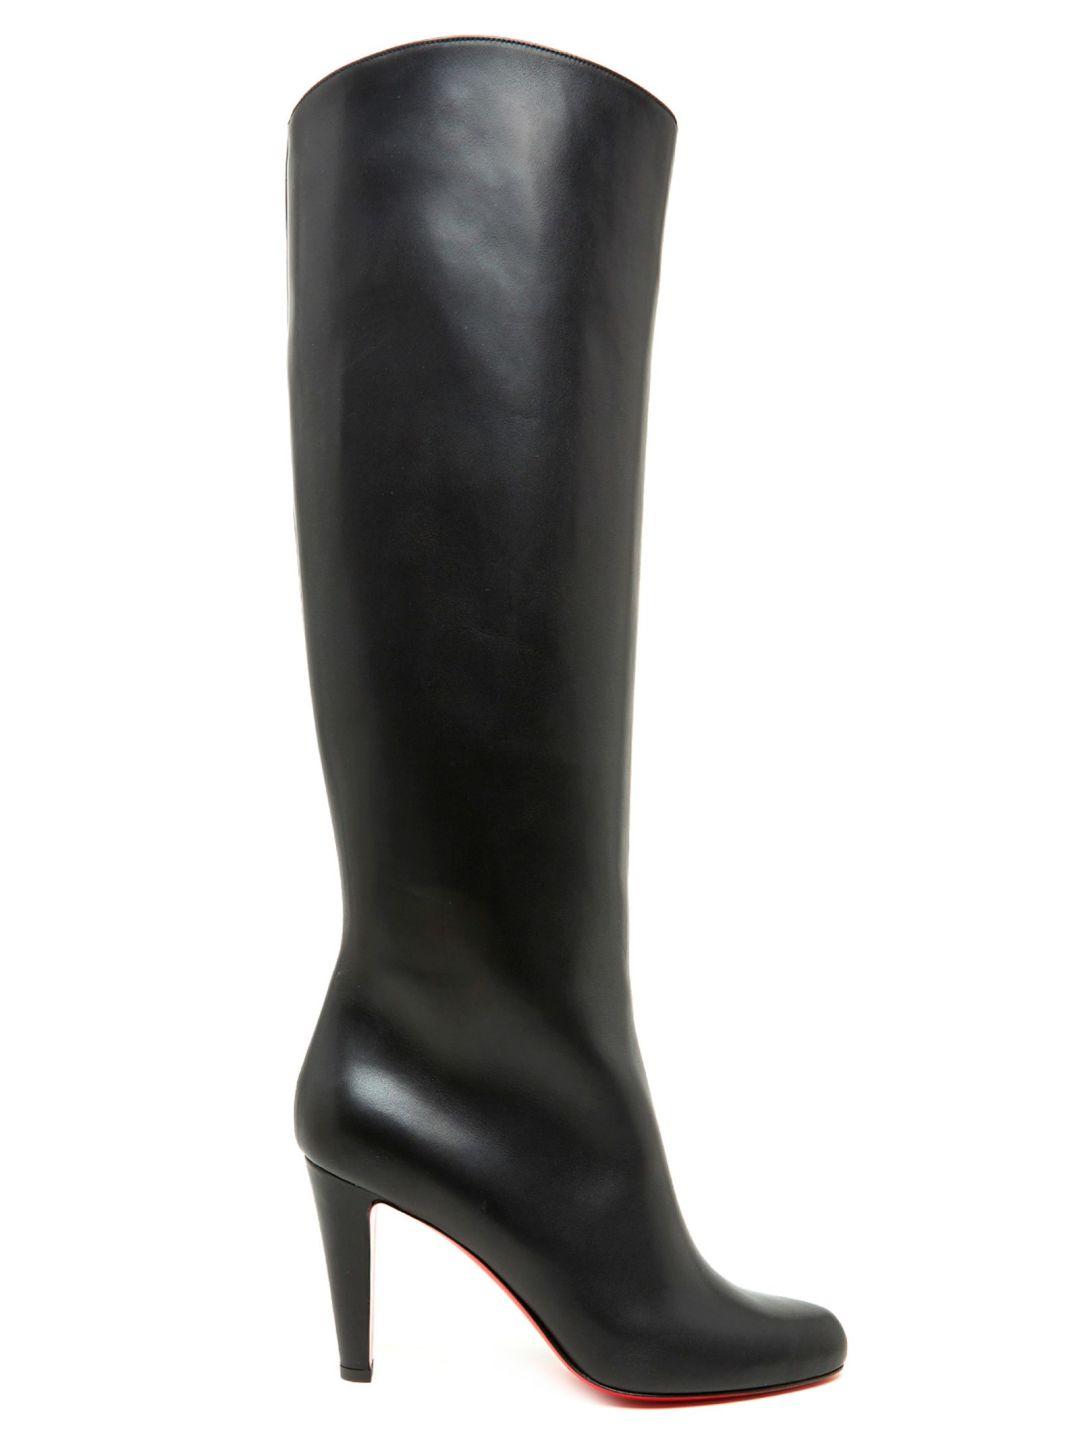 6a194a248c4c Christian Louboutin  marmara  Shoes – Italist.com US –  862.91